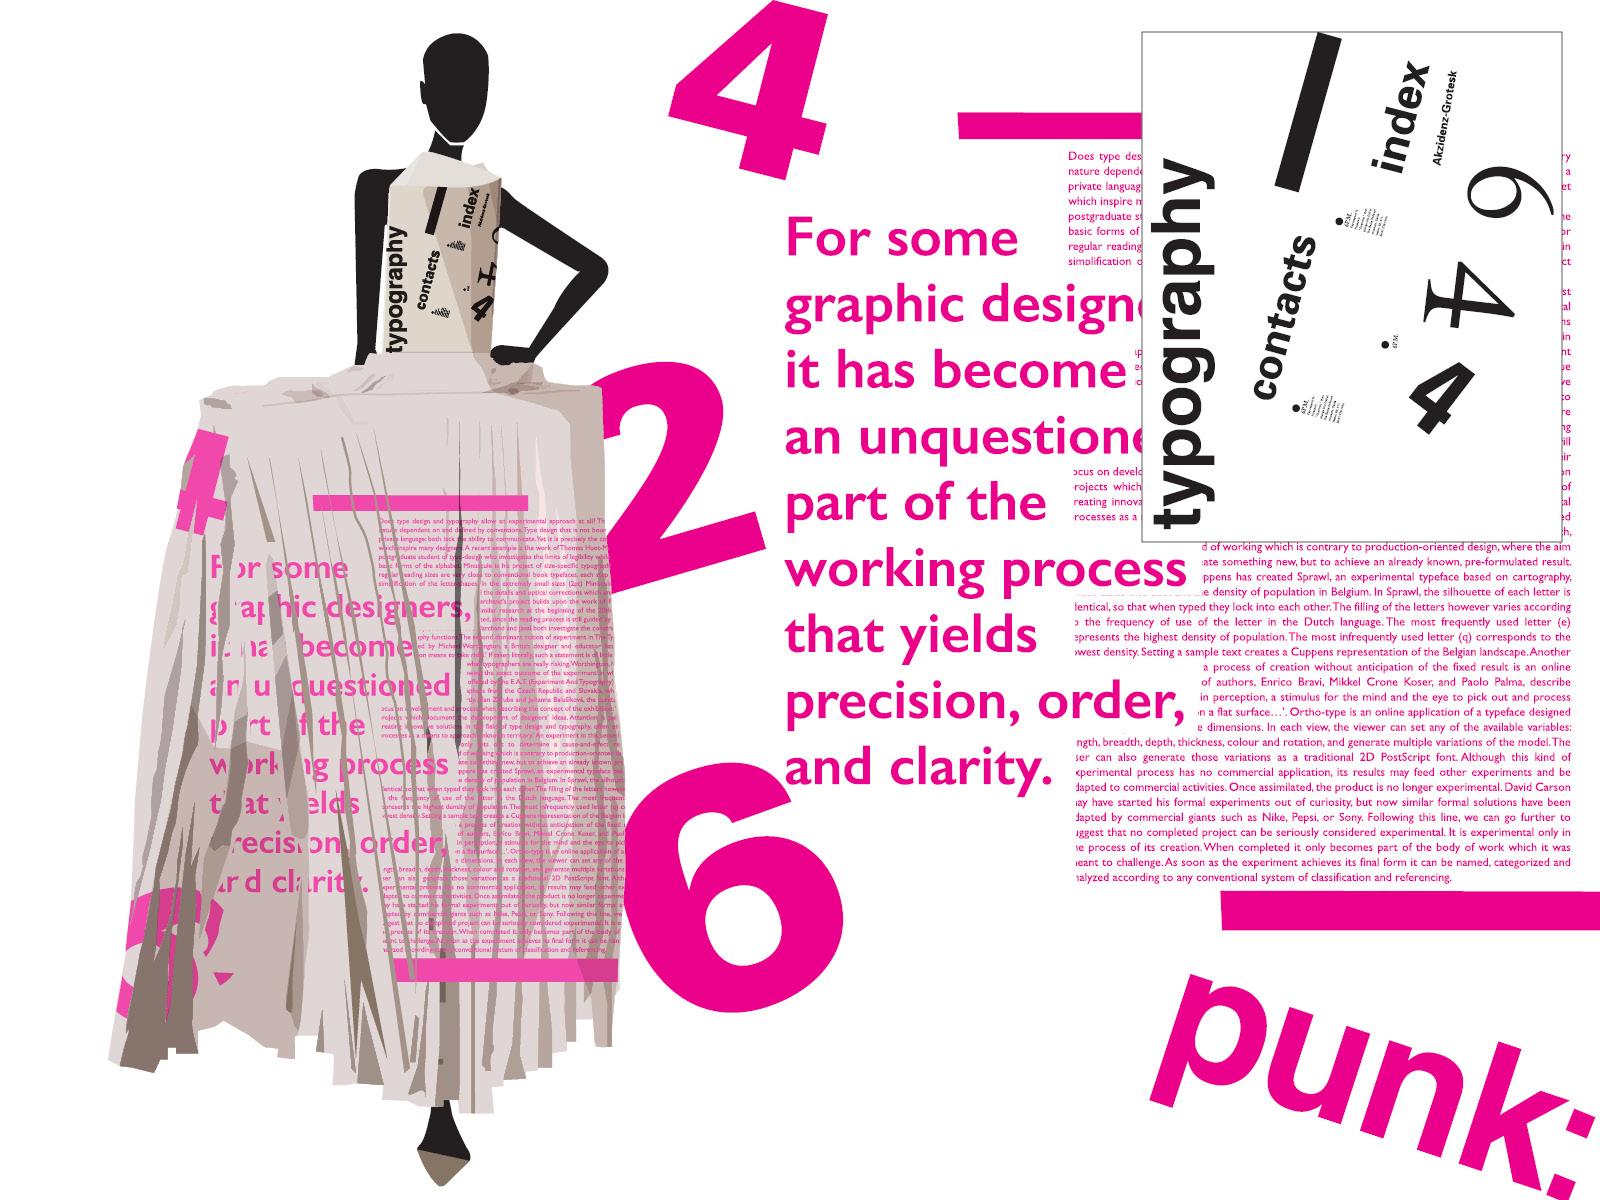 Spirit-Flesh-Magzine-SVA-Design-Sketch-Graphic-Dress-by-Minika-Ko-Atelier